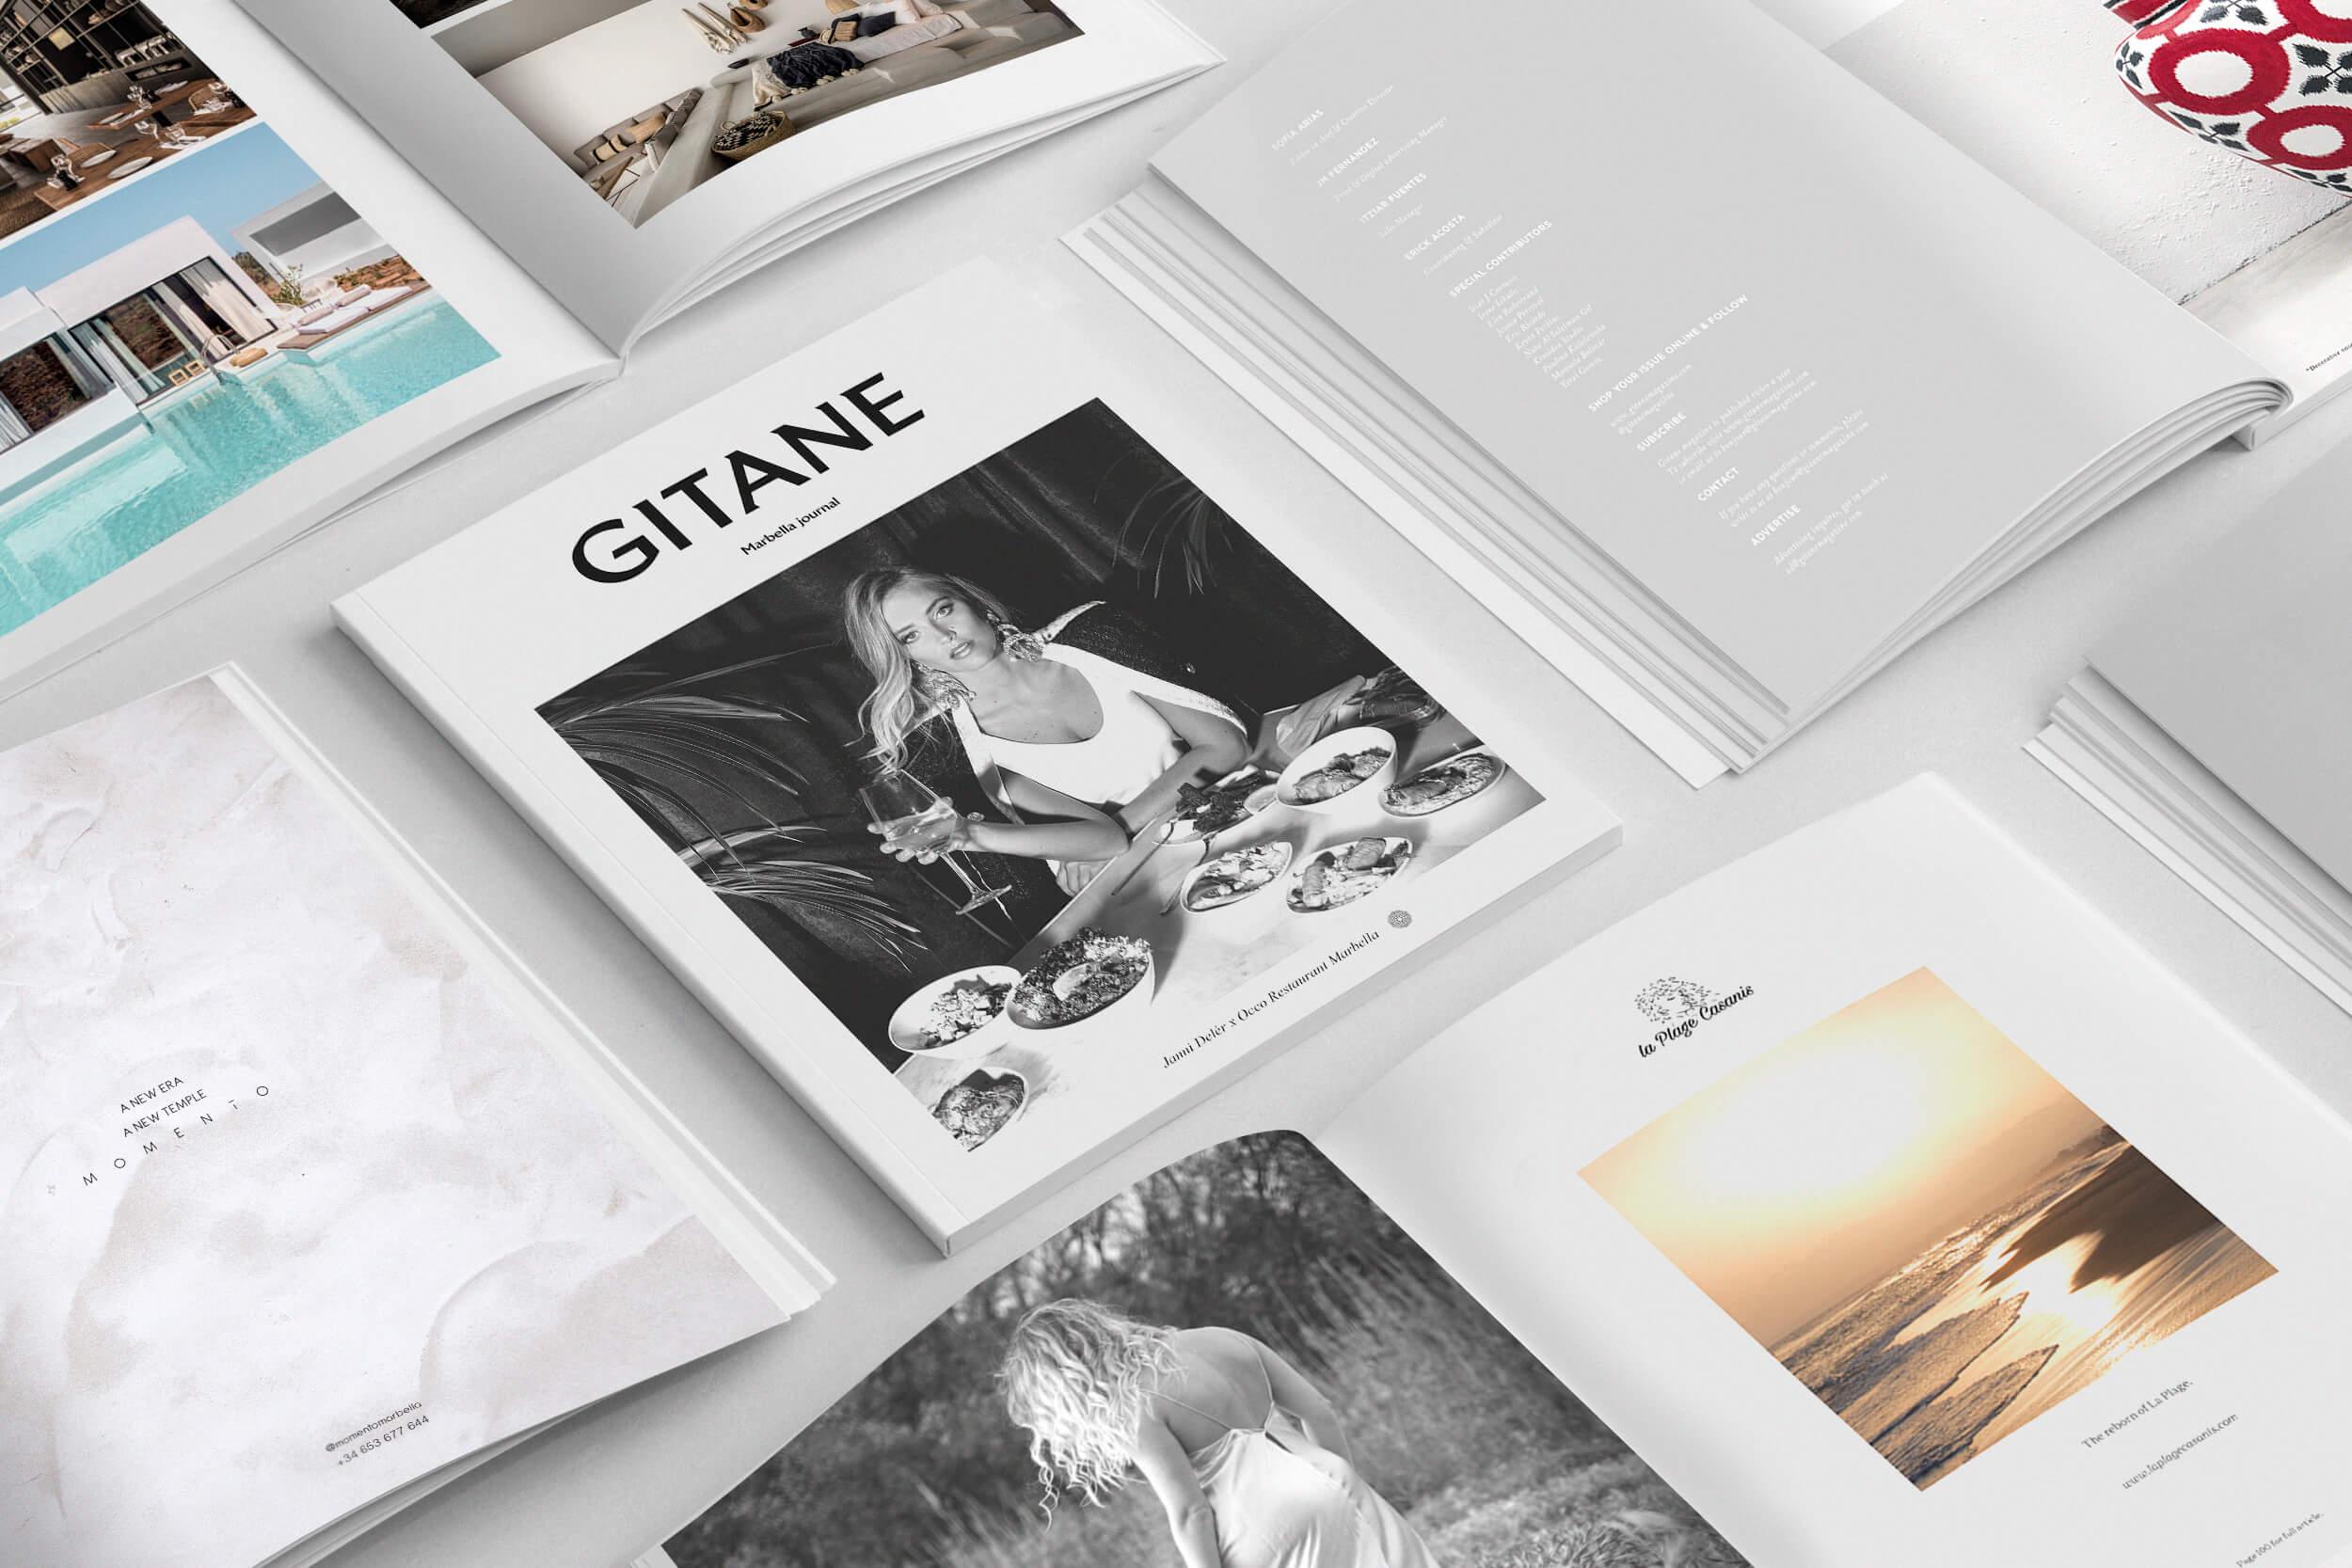 gitane-magazine-about-us